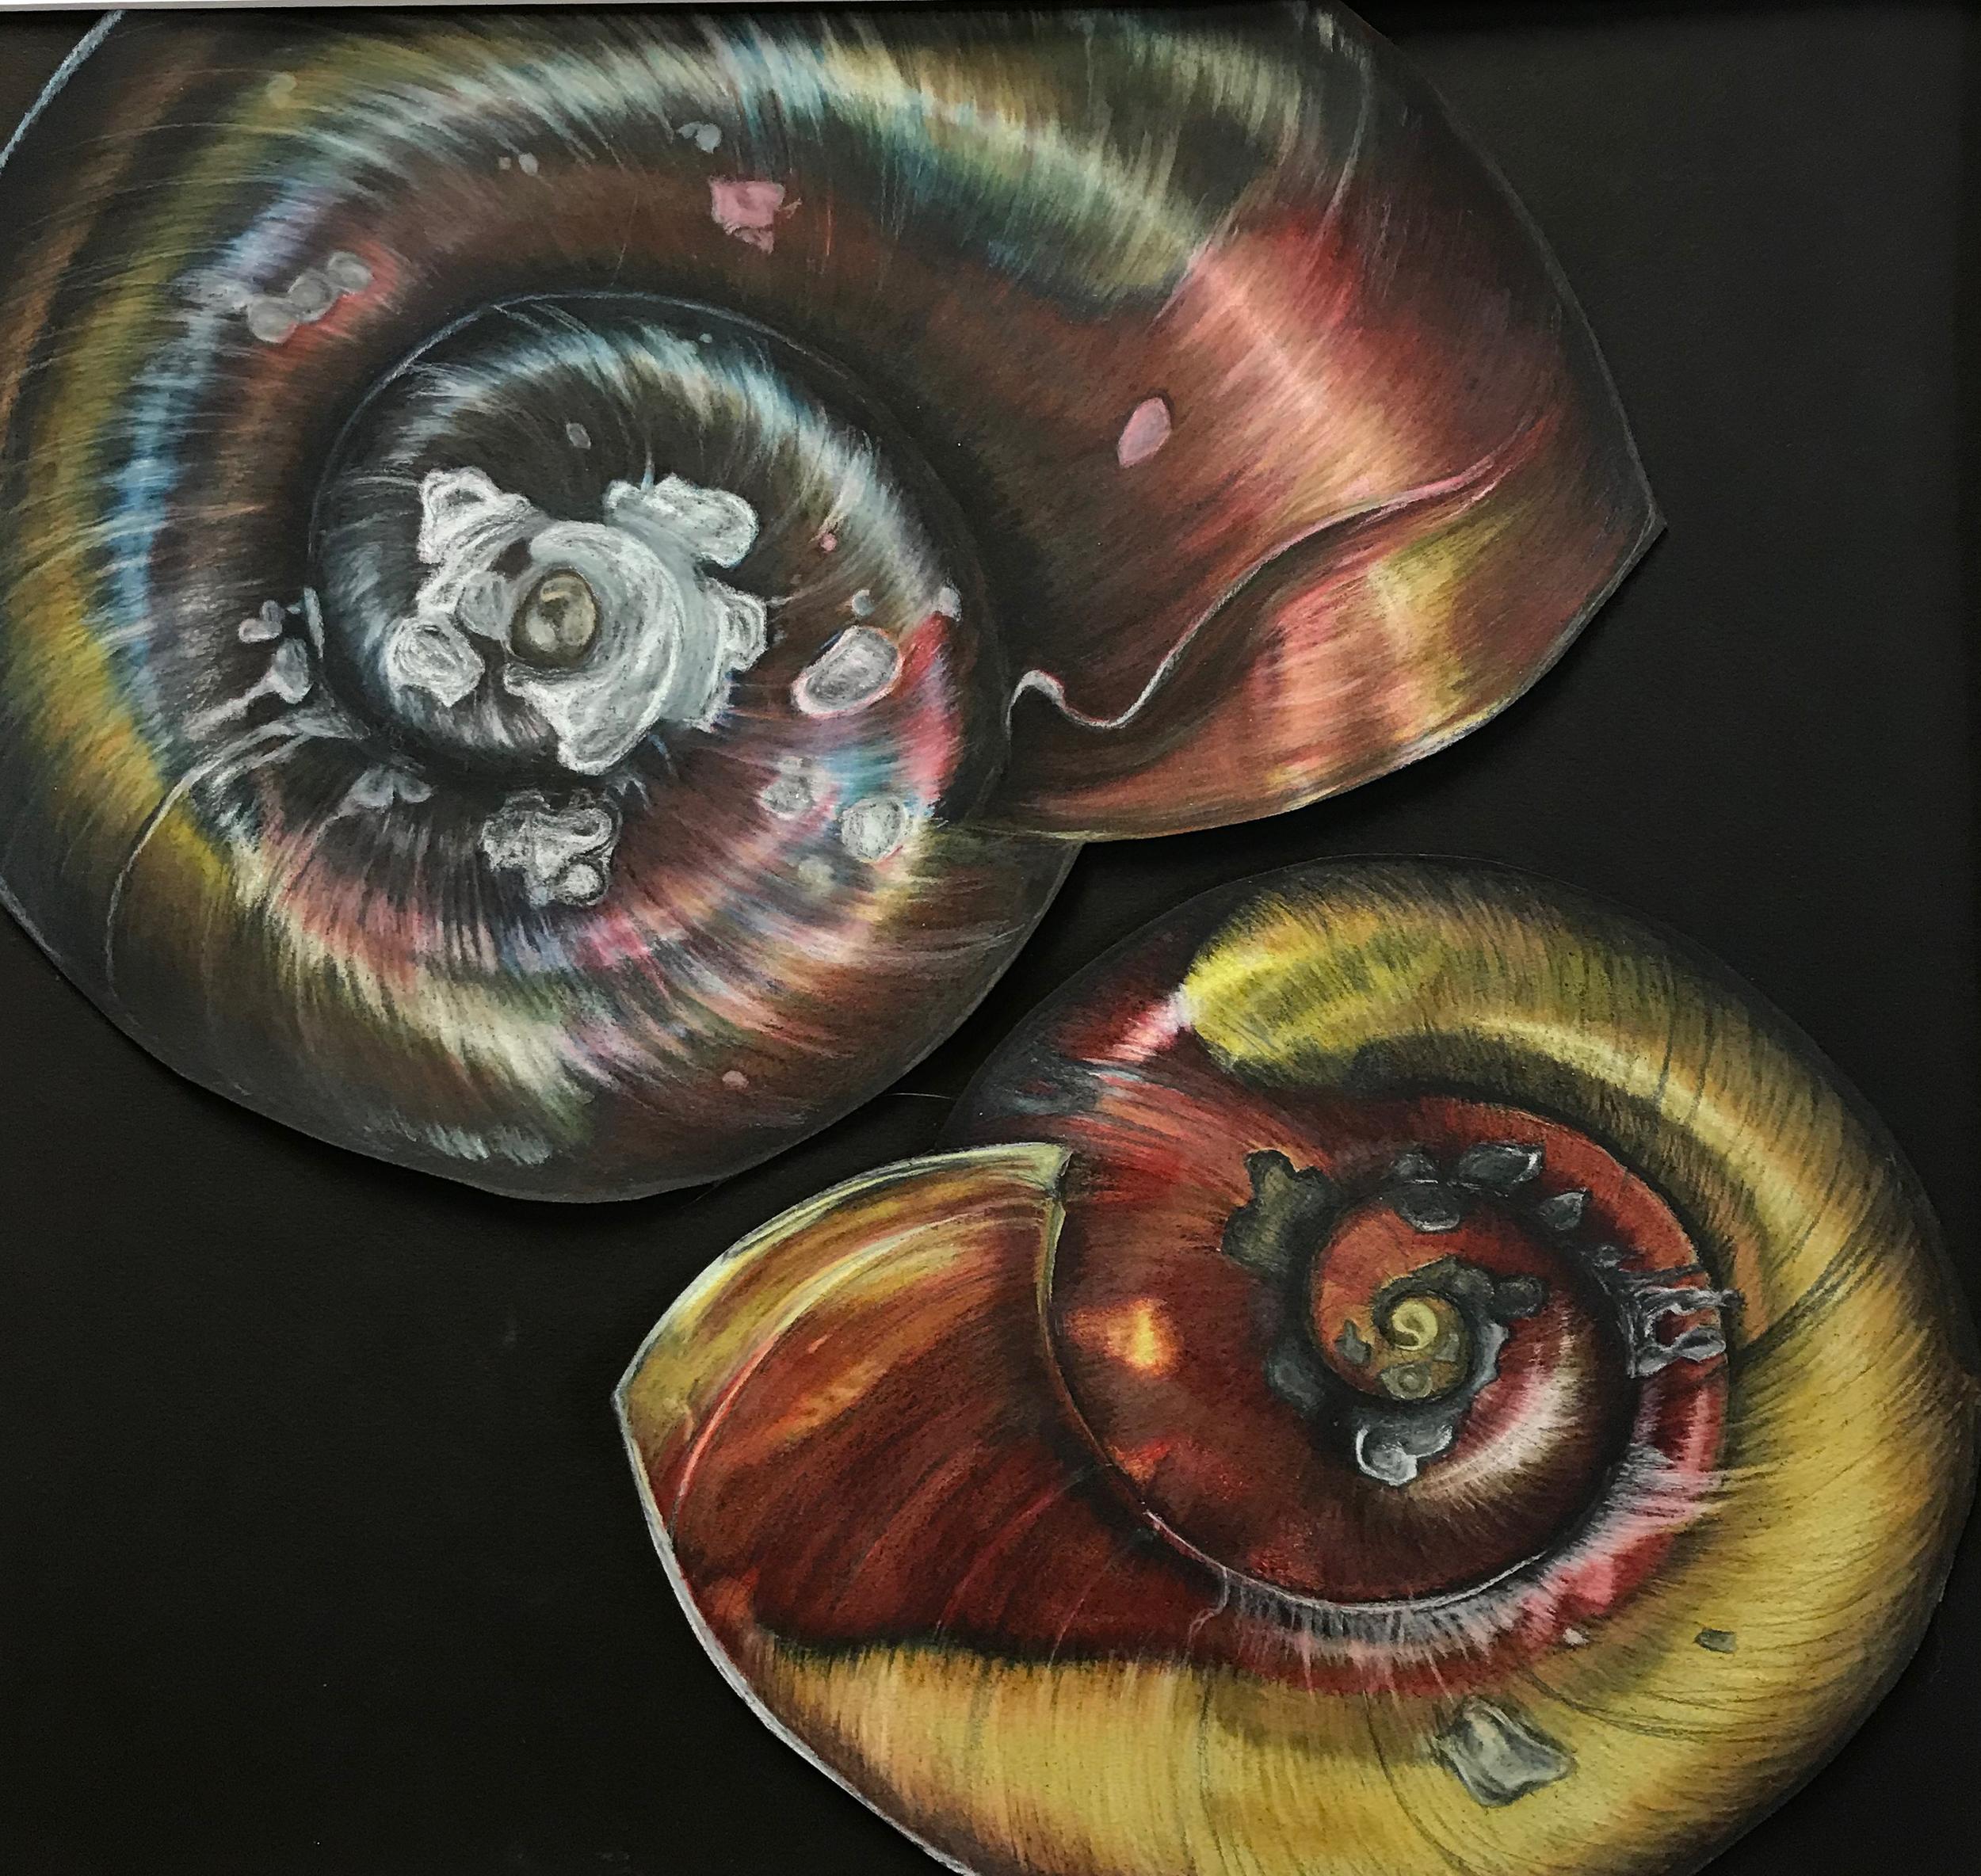 Title: Riverbed, Artist: Sarah Hanson, Scientists: Dr. David Civitello and Dr. Kelsey Shaw